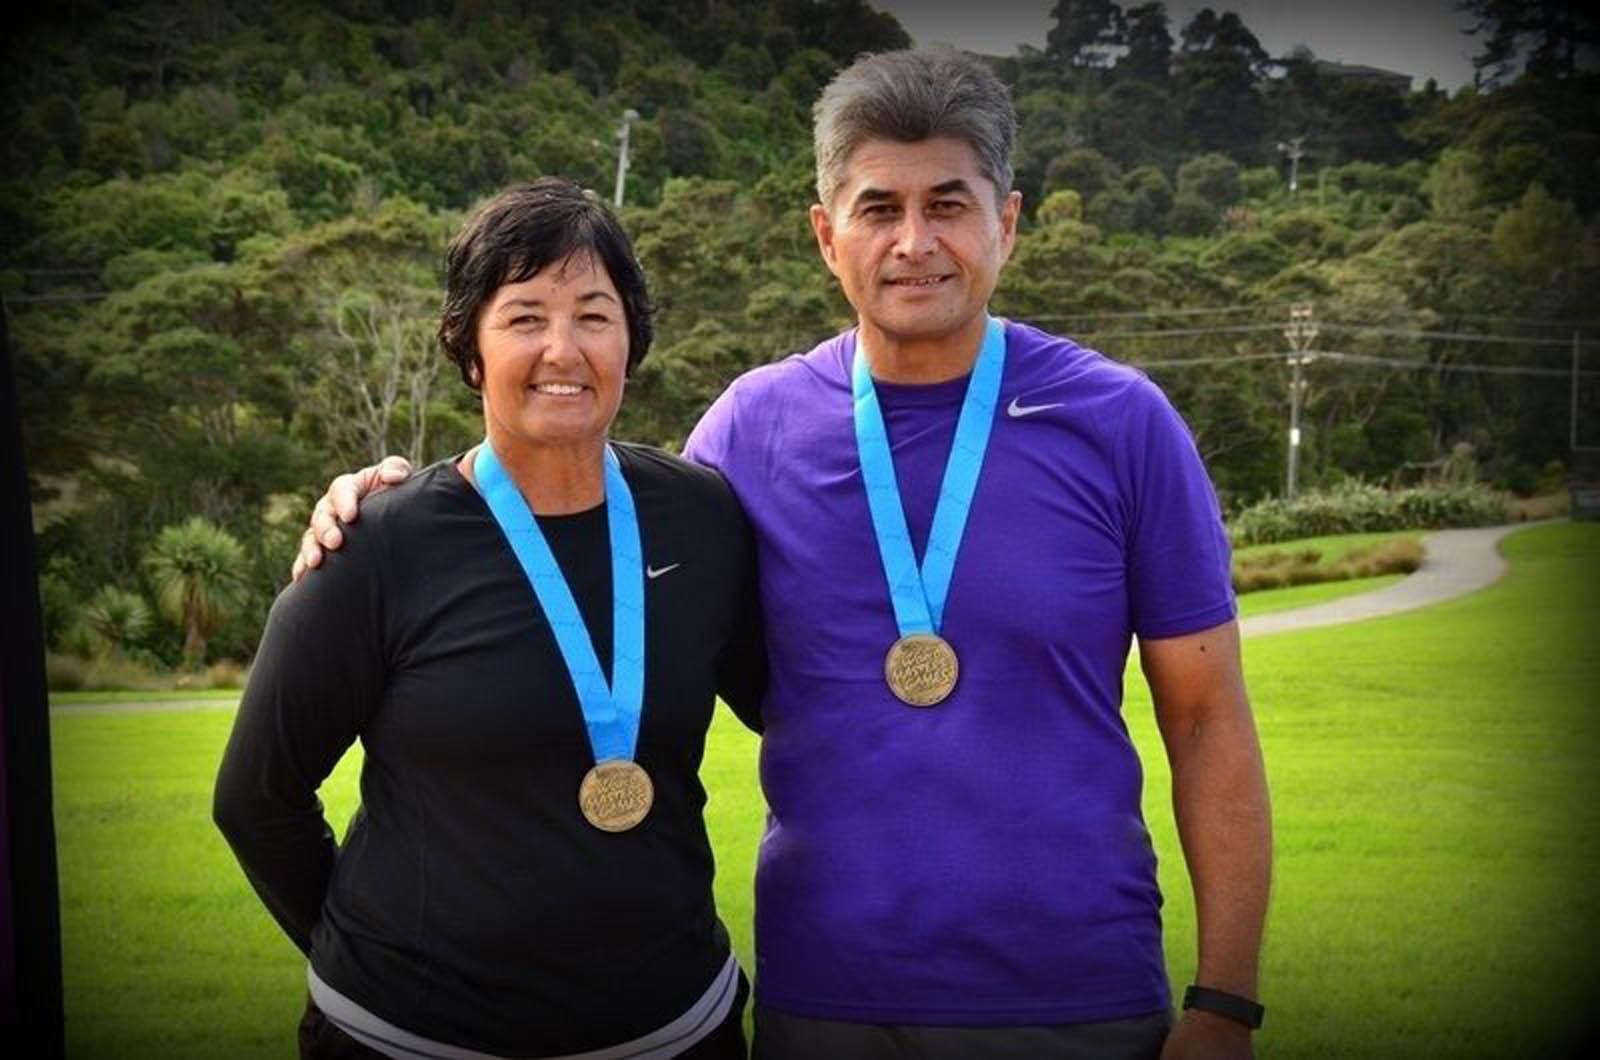 Jane GELDARD & Kaipara SOLOMON – GOLD 50+ A MxDoubles